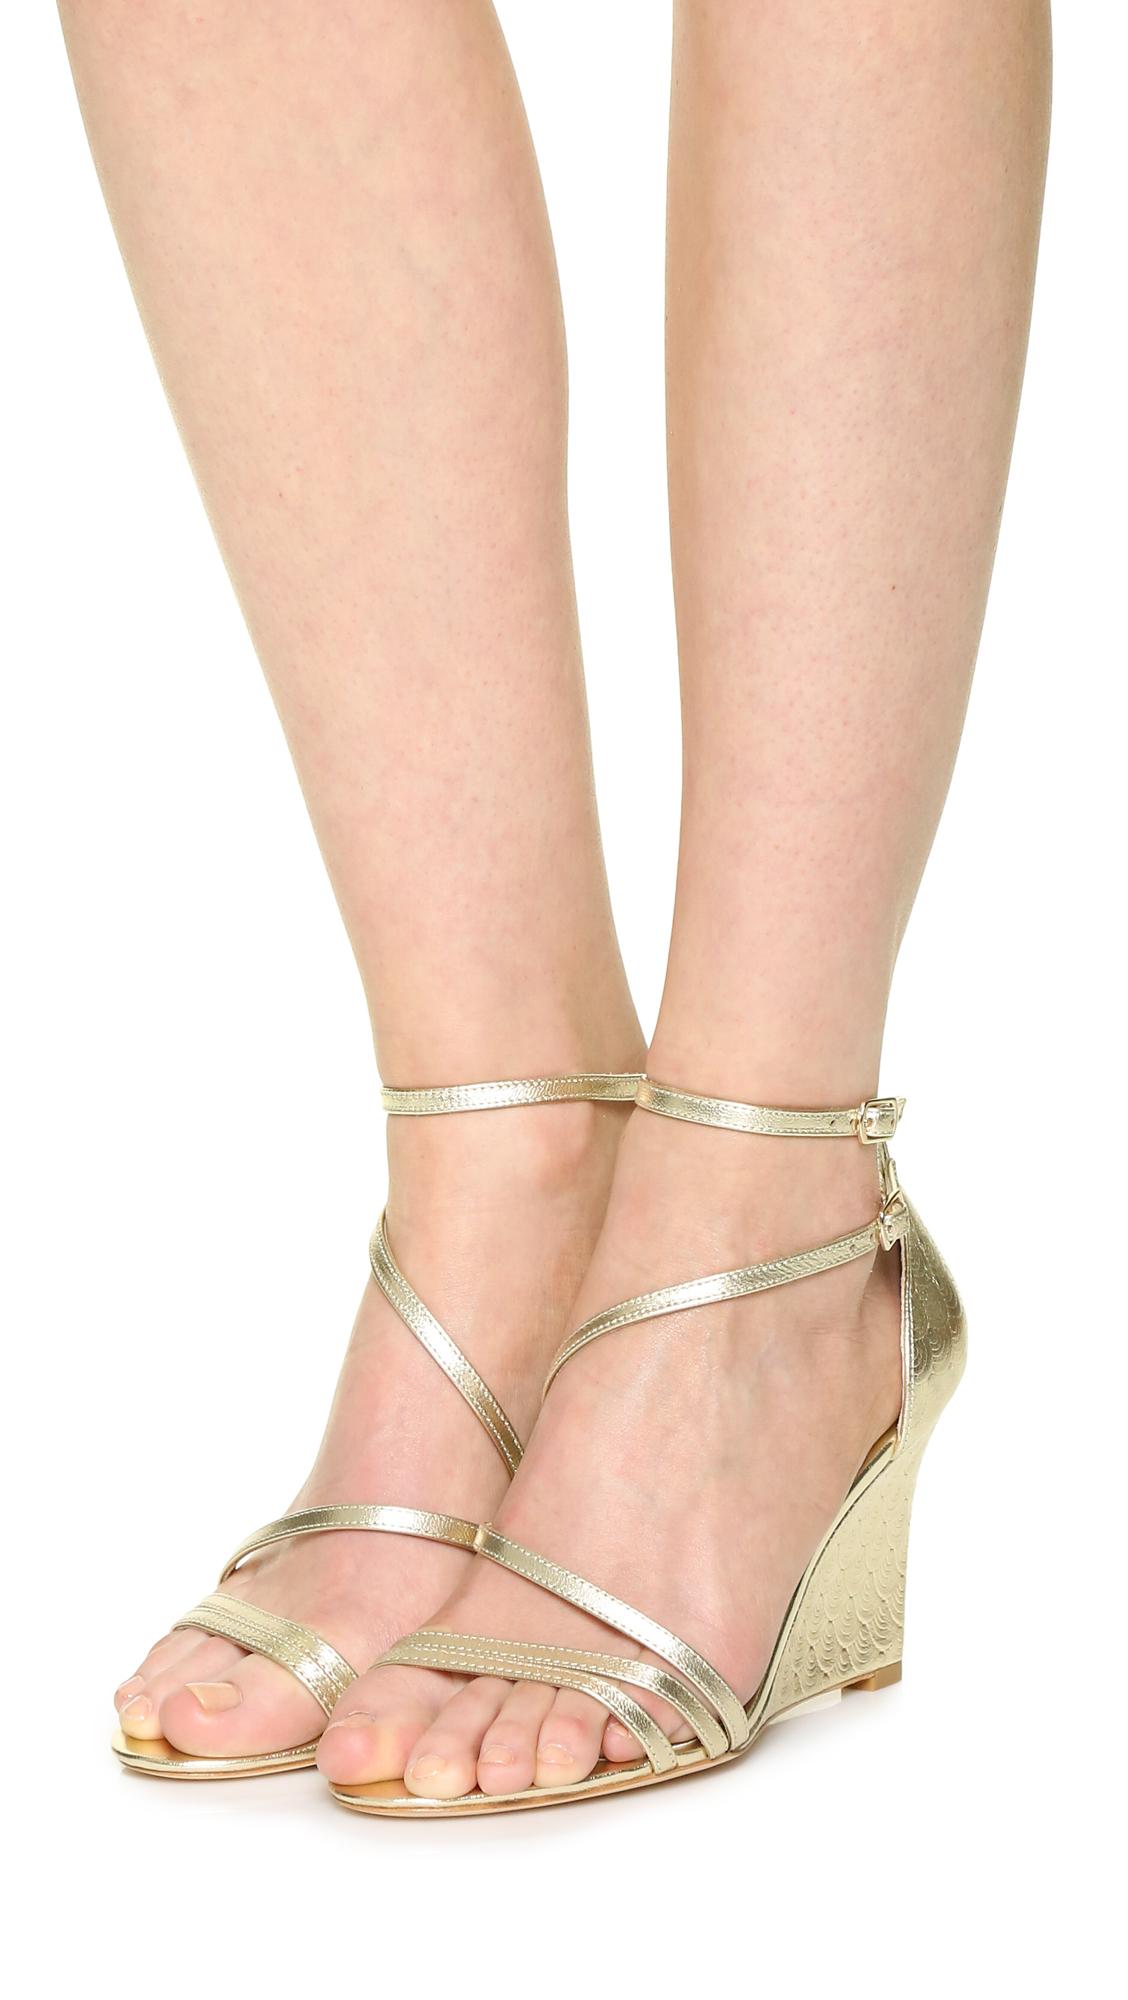 14927bb07 Lyst - Badgley Mischka Carnation Ii Wedge Sandals in Metallic